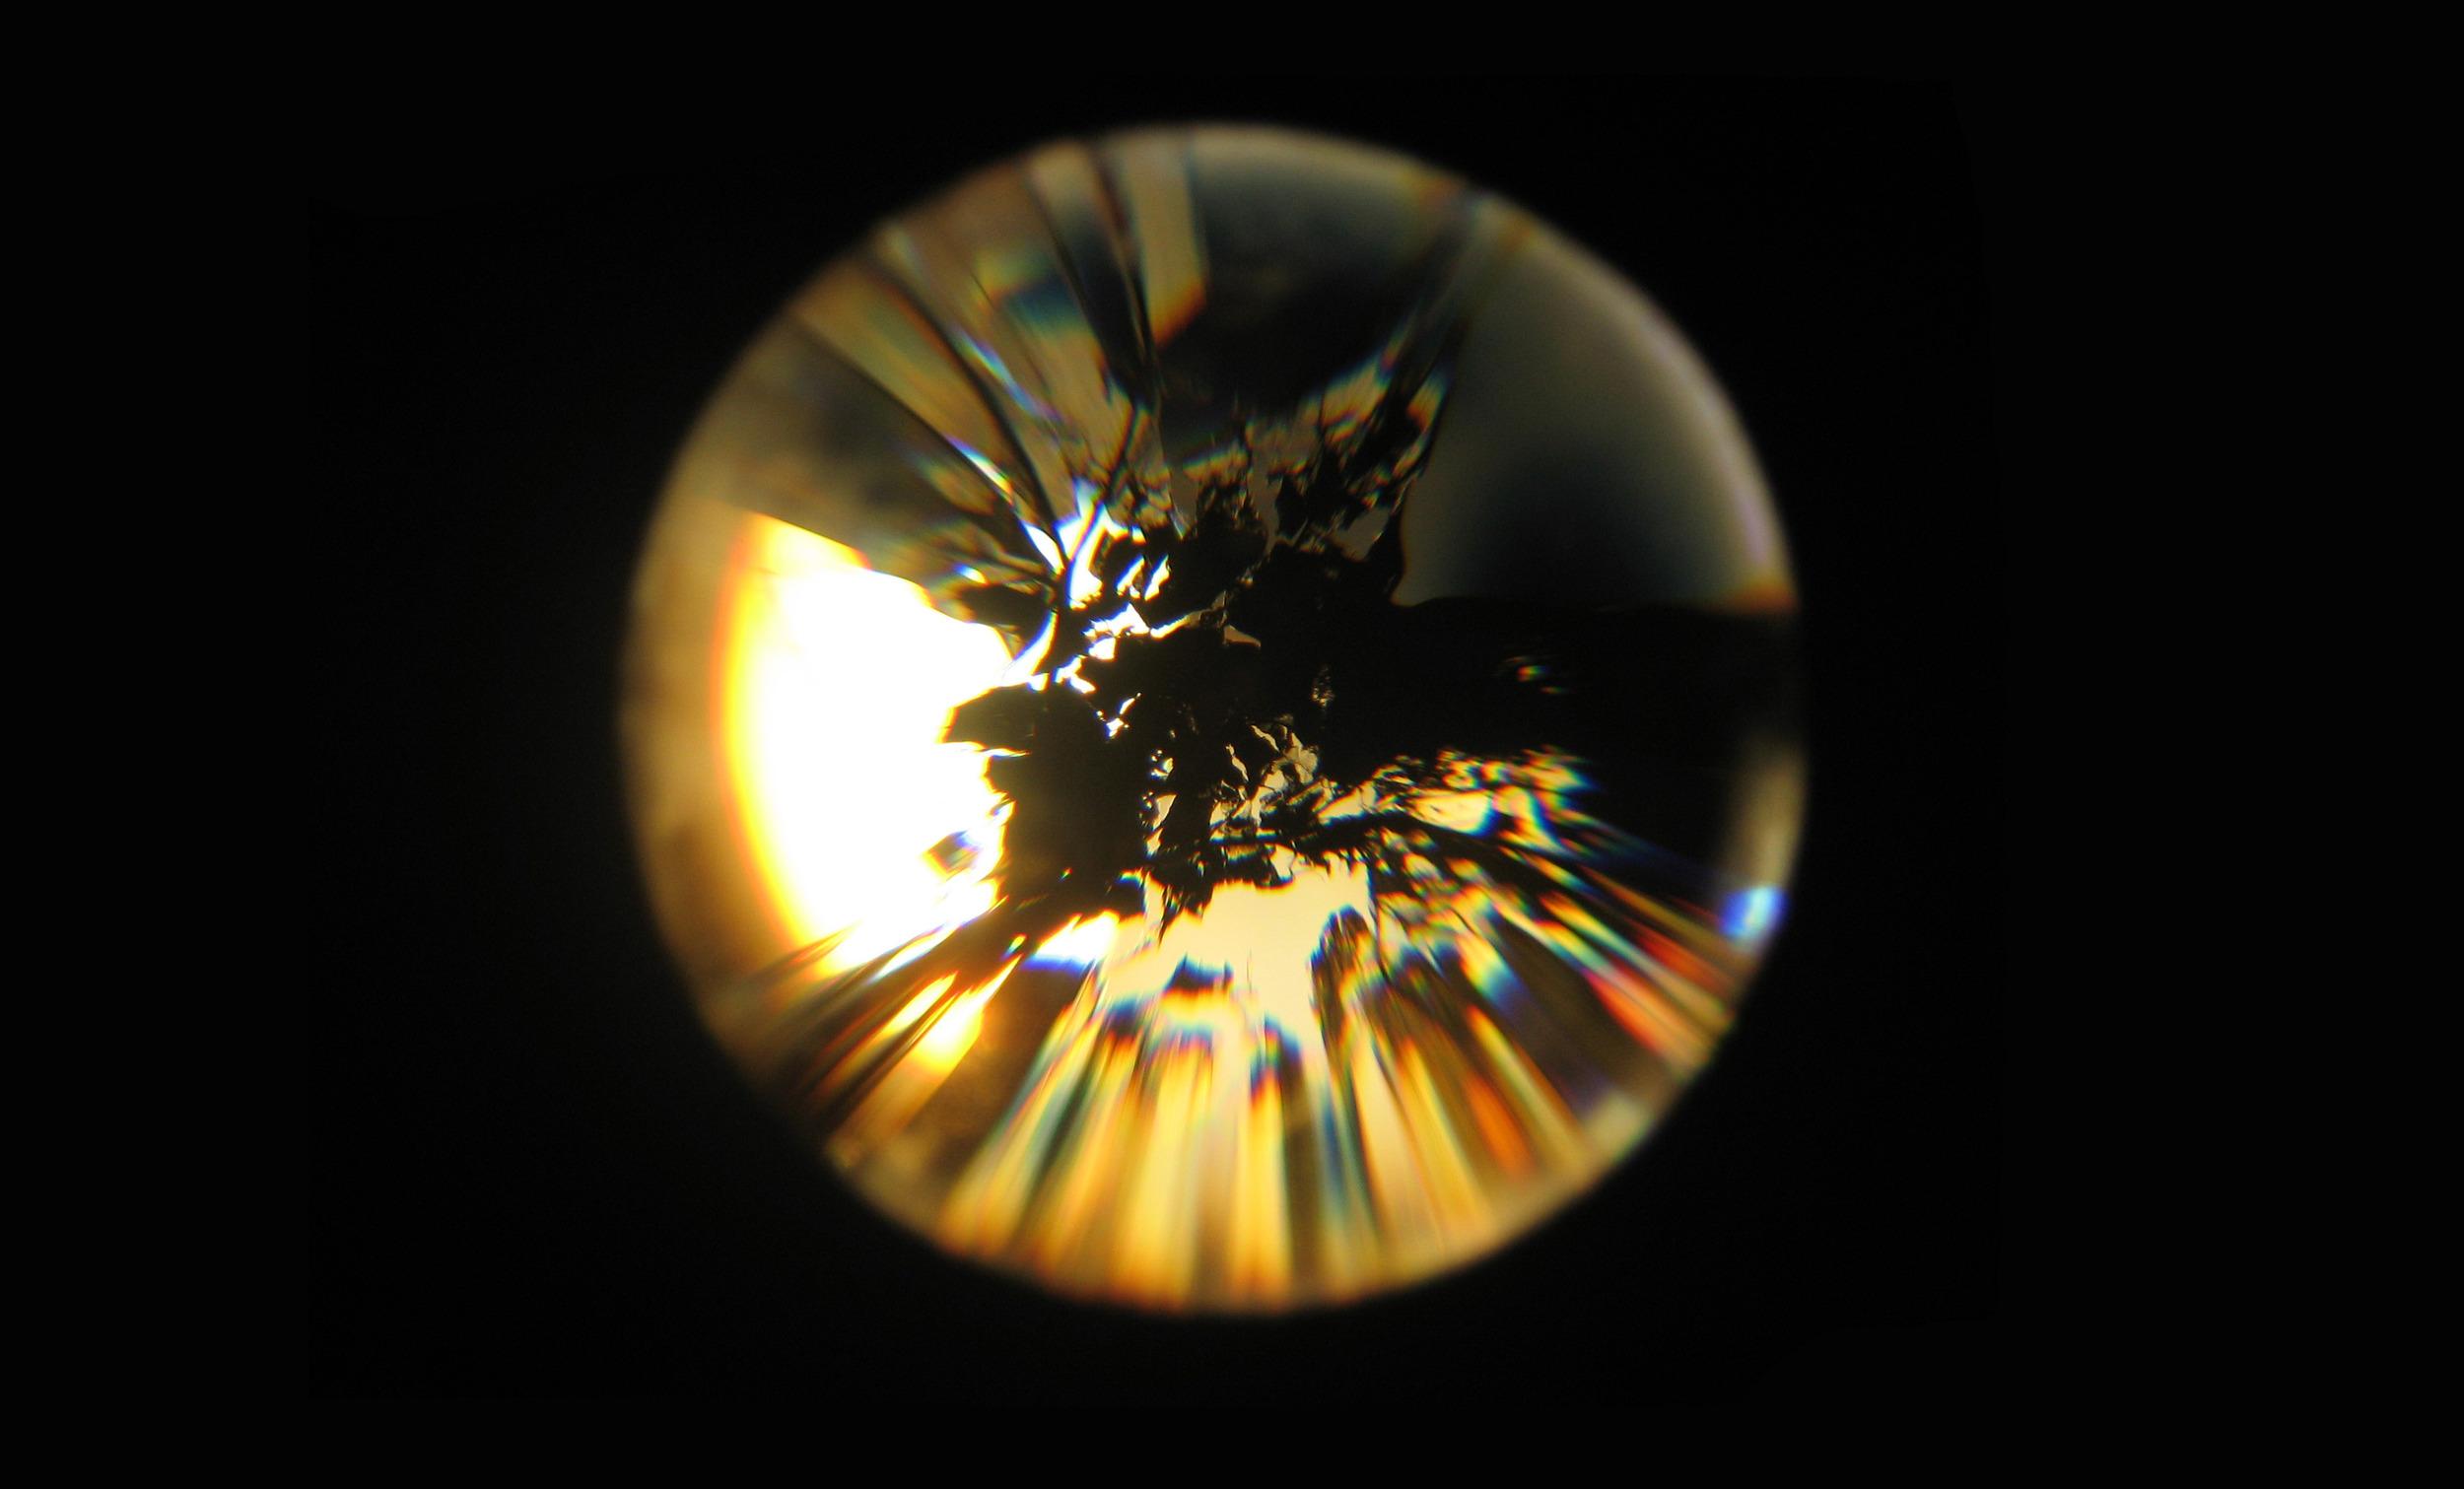 Projection Cluster. Deconstructed slide projectors, condenser lenses and debris. 2006